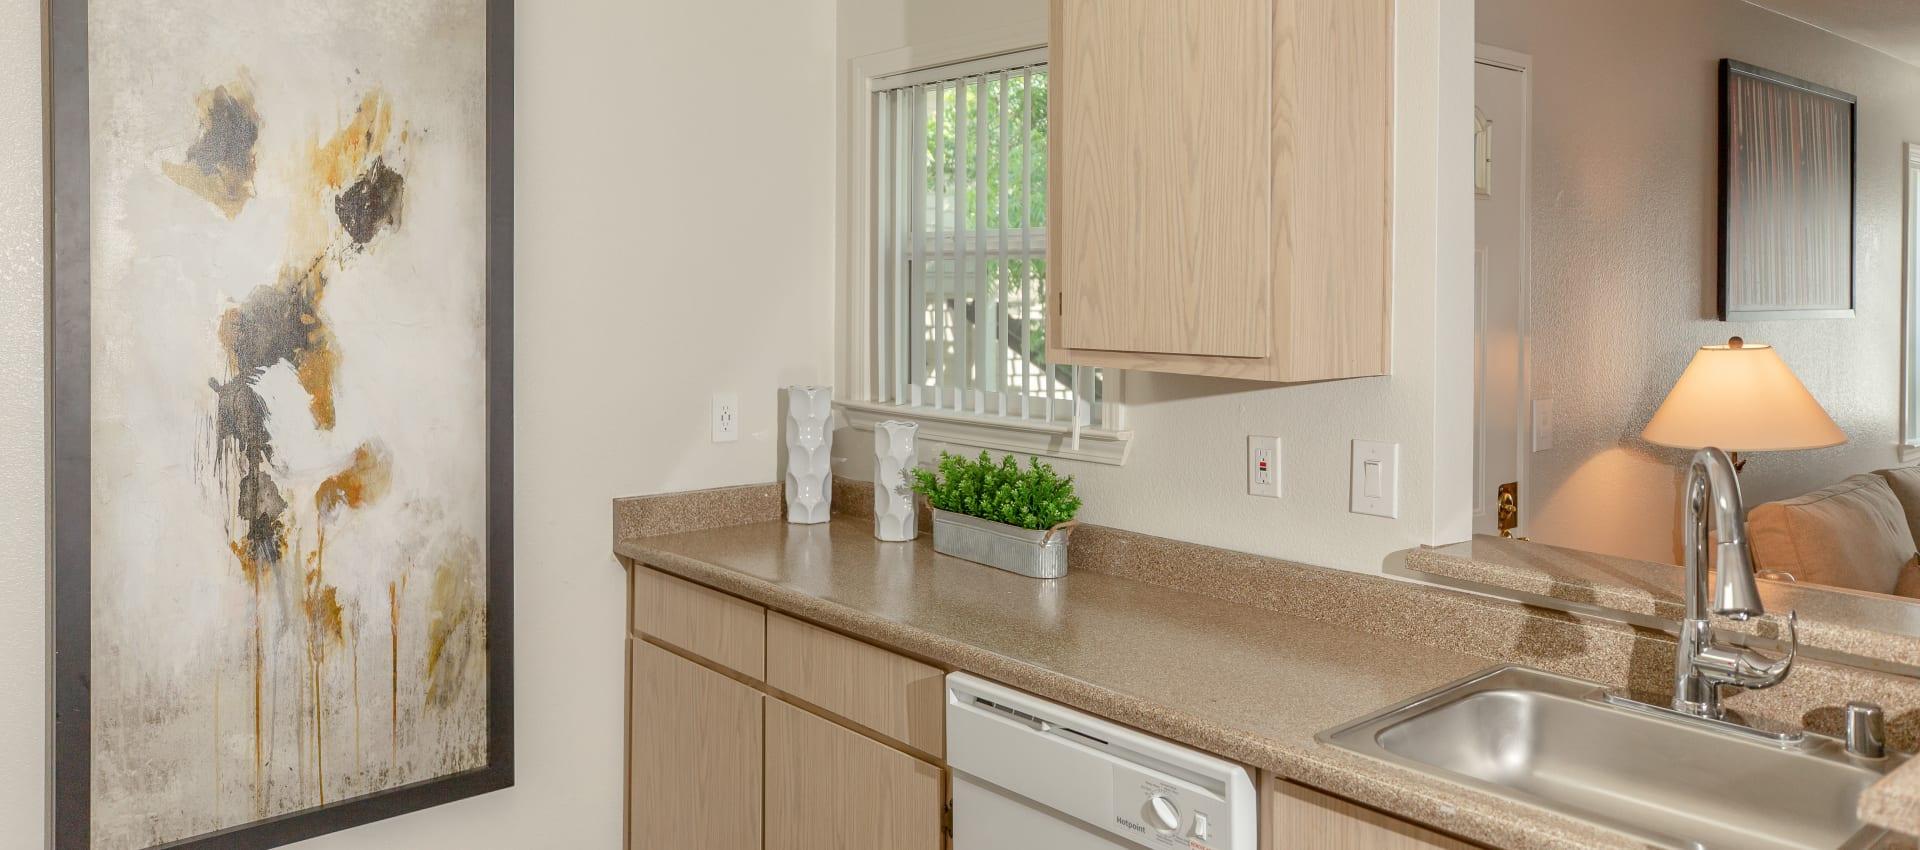 Kitchen area at Shaliko in Rocklin, California.